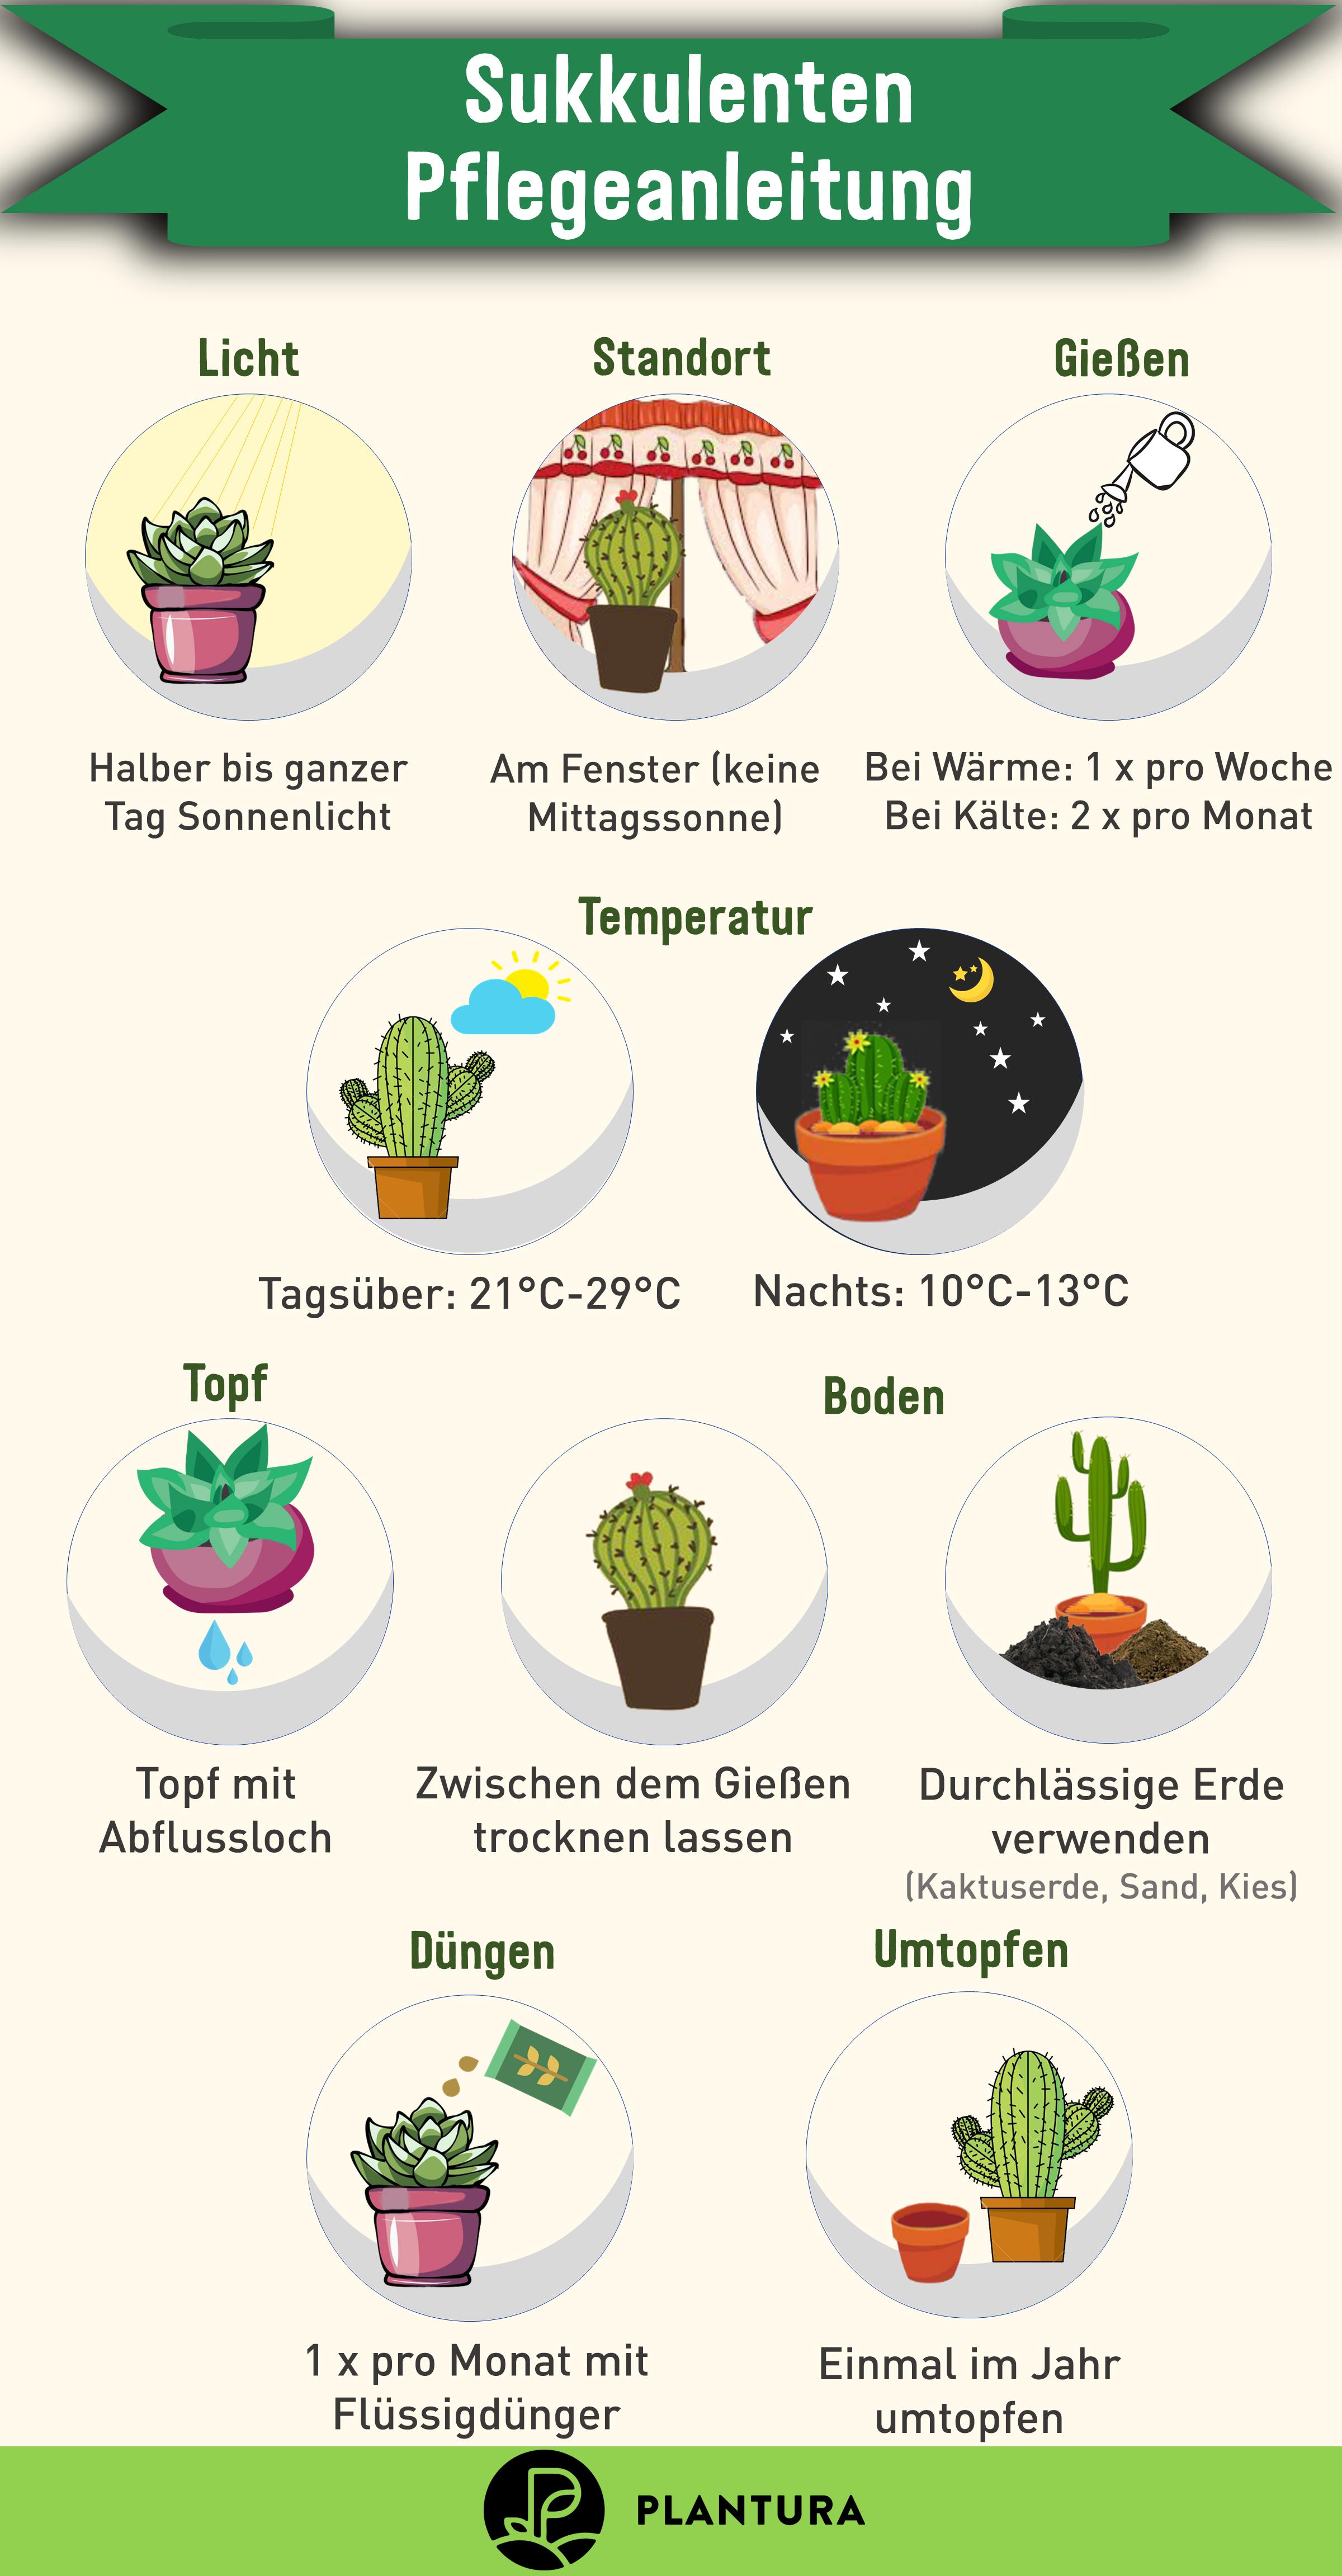 Sukkulenten pflegen: Sukkulenten richtig gießen, düngen & Co. - Plantura